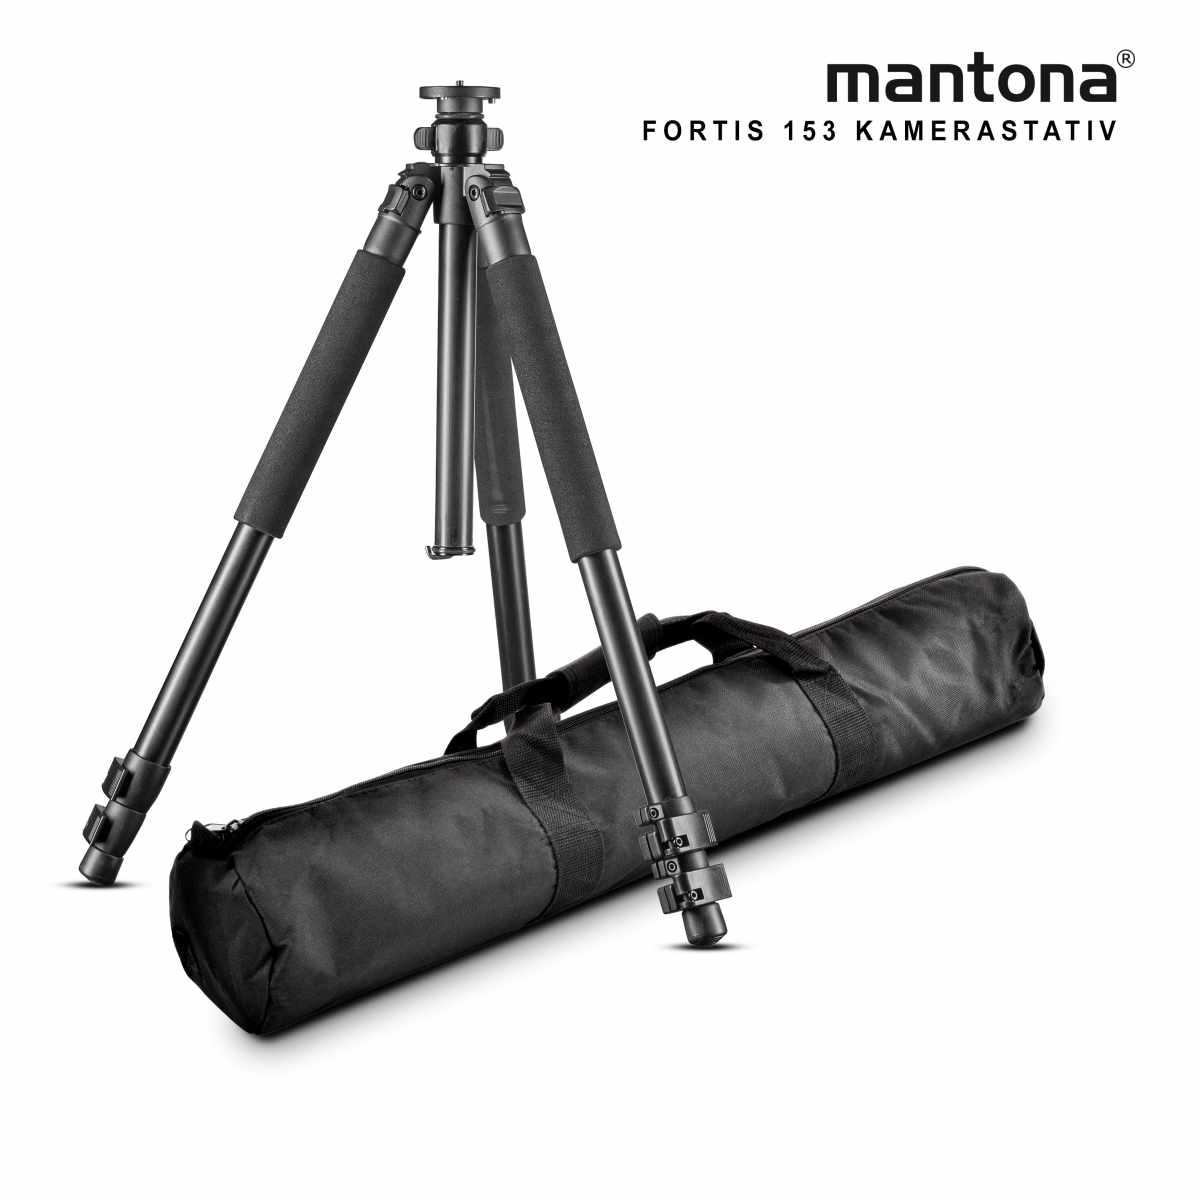 Mantona Basic Fortis 153 Tripod